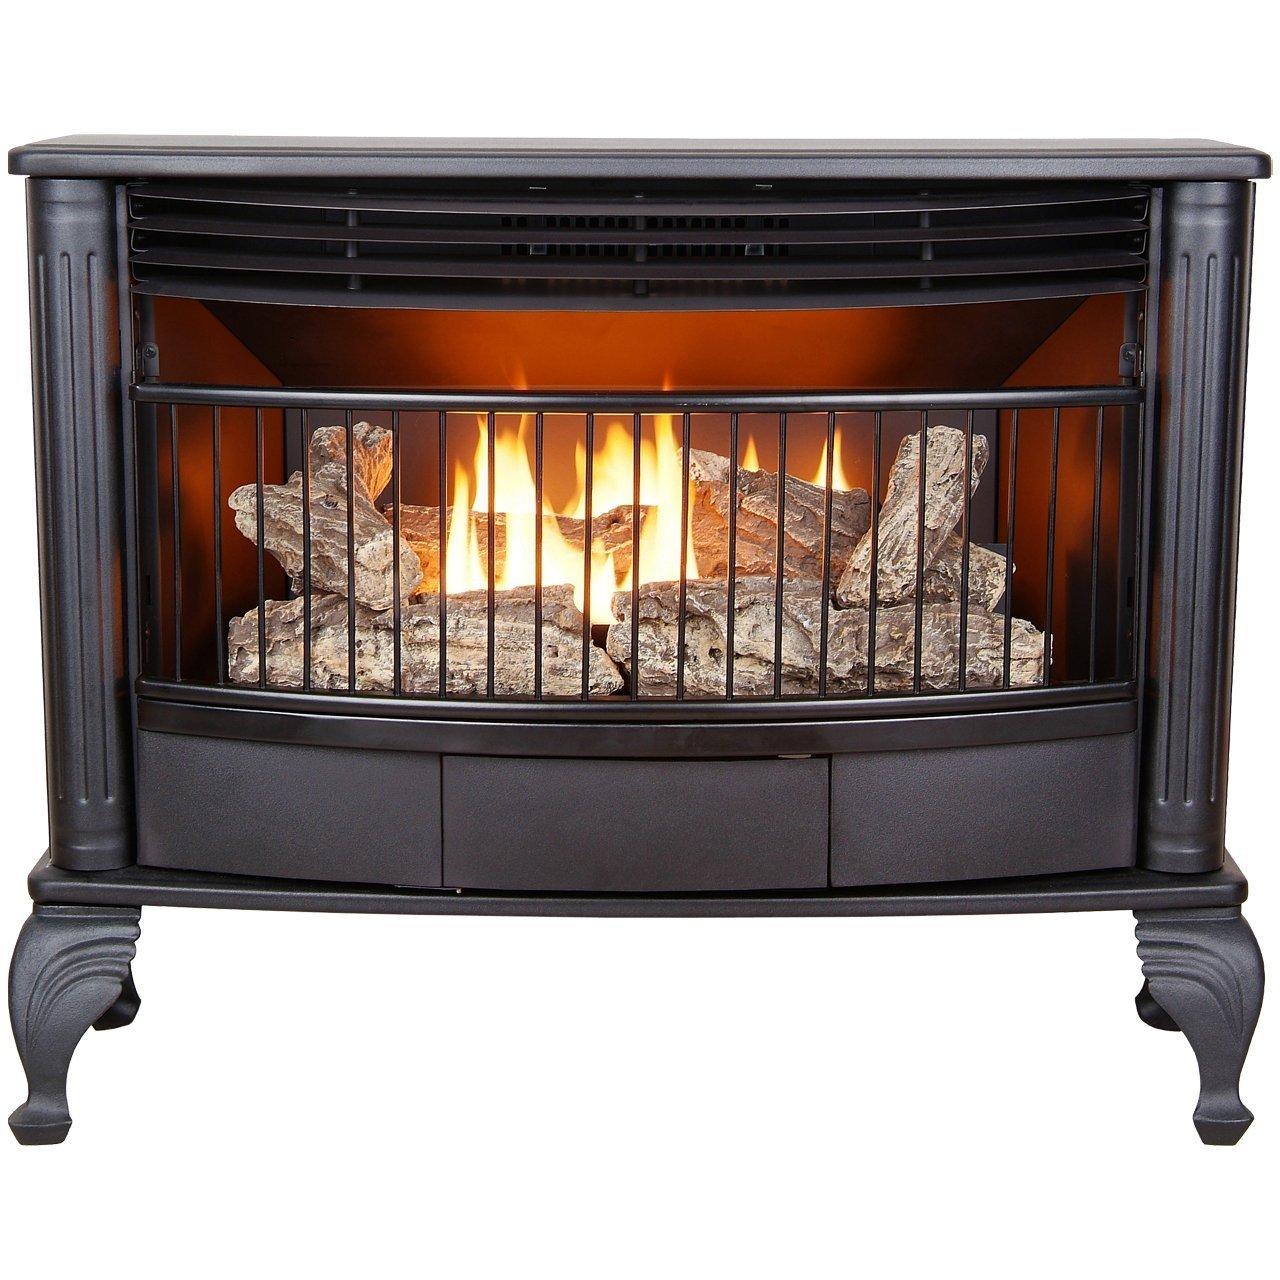 ventless propane fireplace amazon com rh amazon com ventless propane fireplaces and stoves propane ventless fireplace with mantel